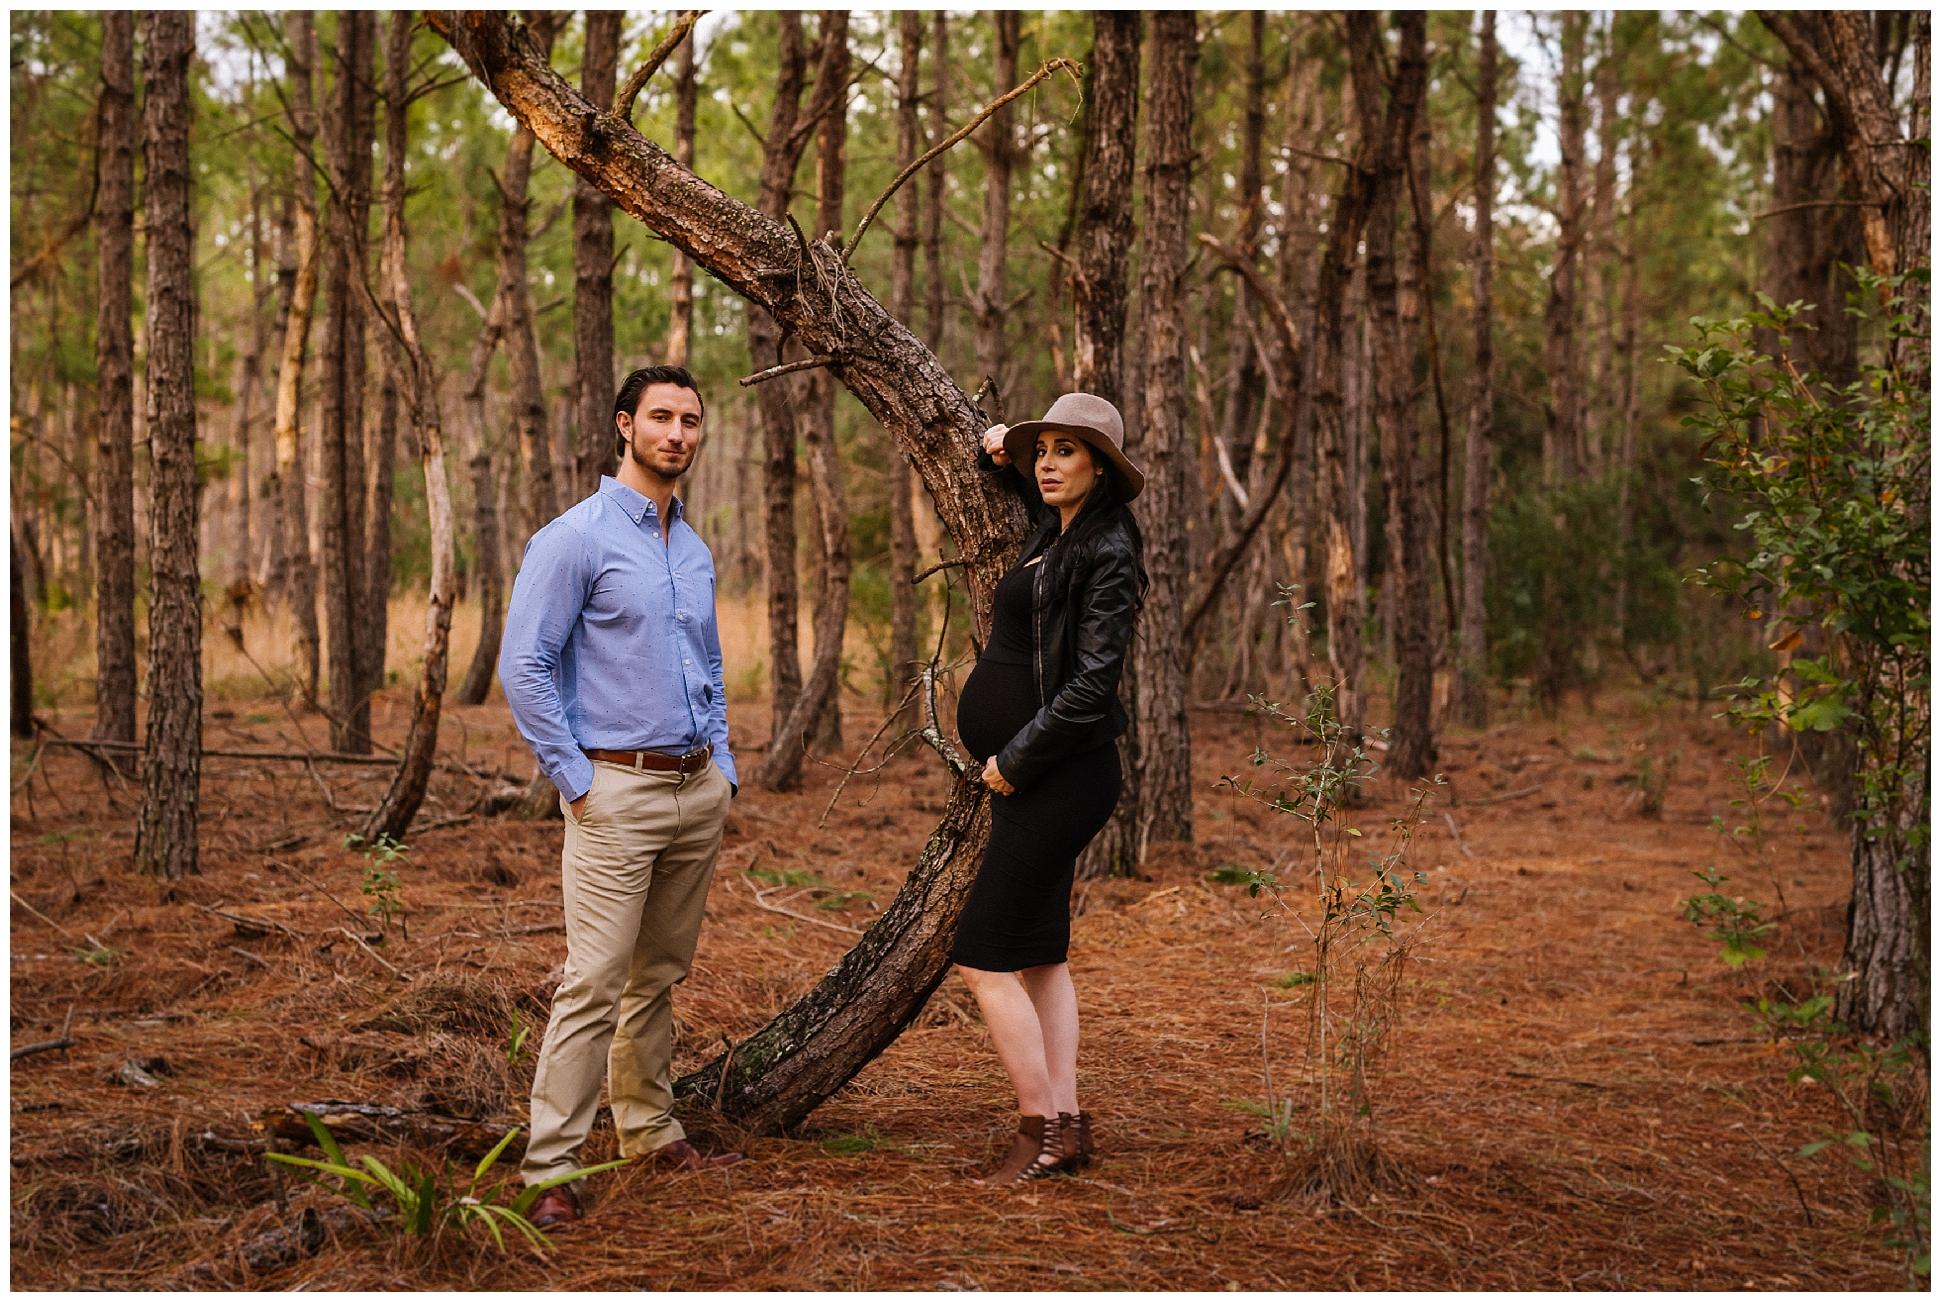 Tampa-maternity-photographer-morris-bridge-park-hip-tight-black-dress-woods_0011.jpg